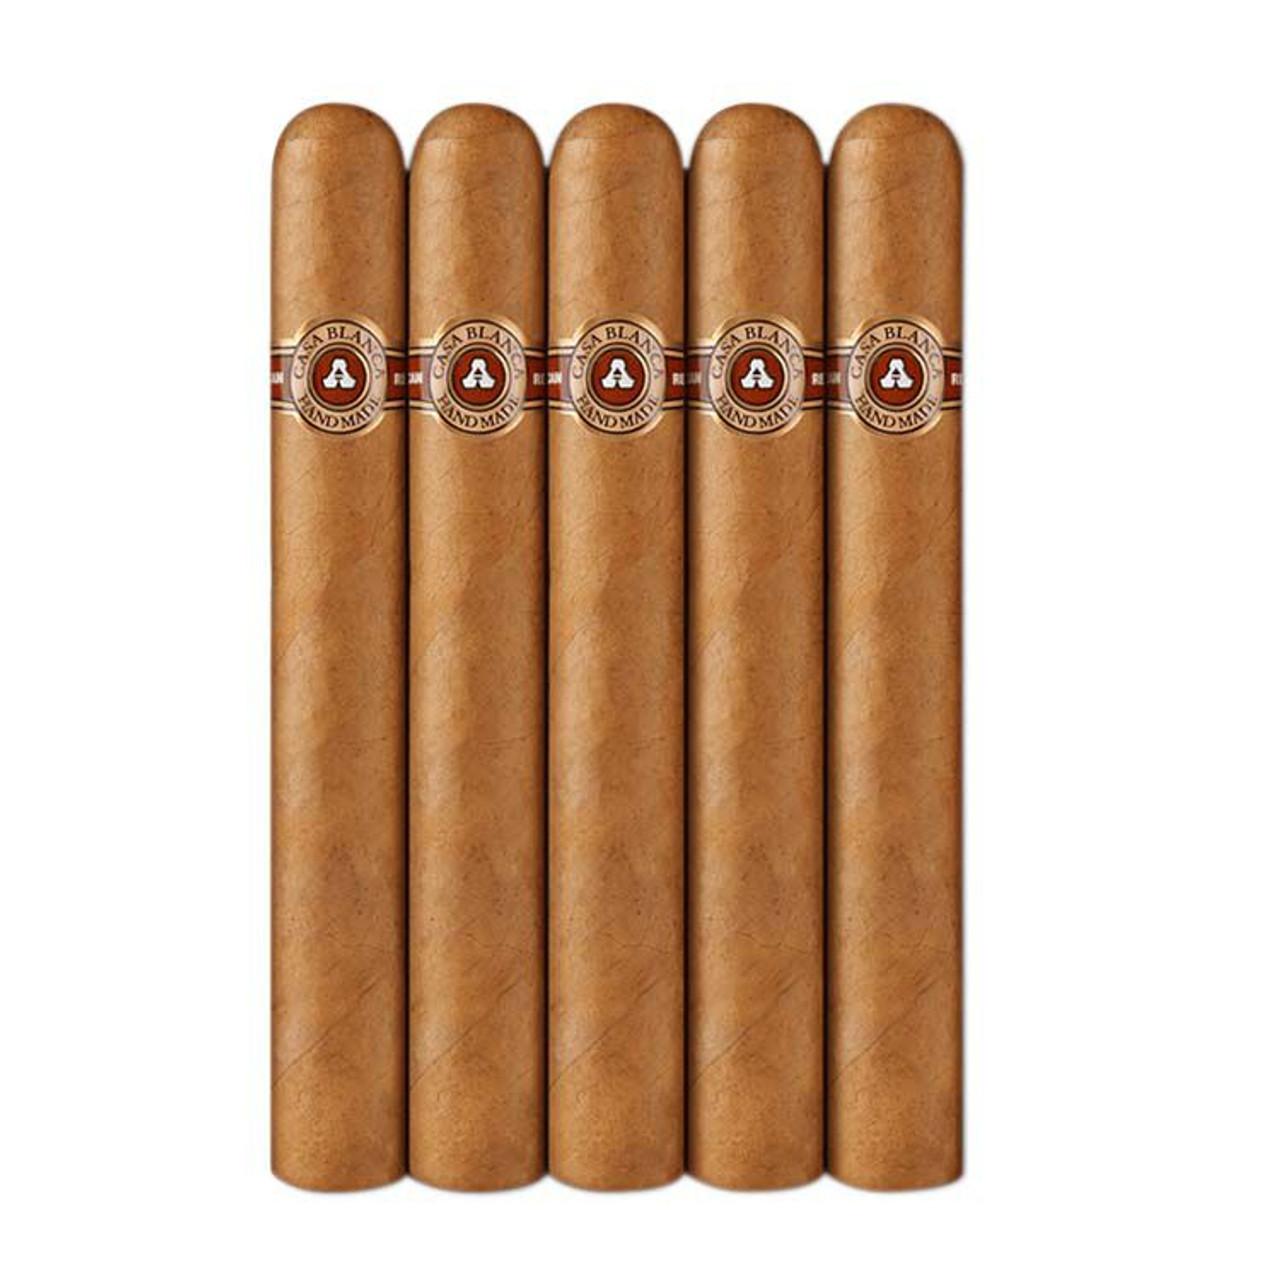 Casa Blanca Magnum Cigars - 7 x 60 (Pack of 5)